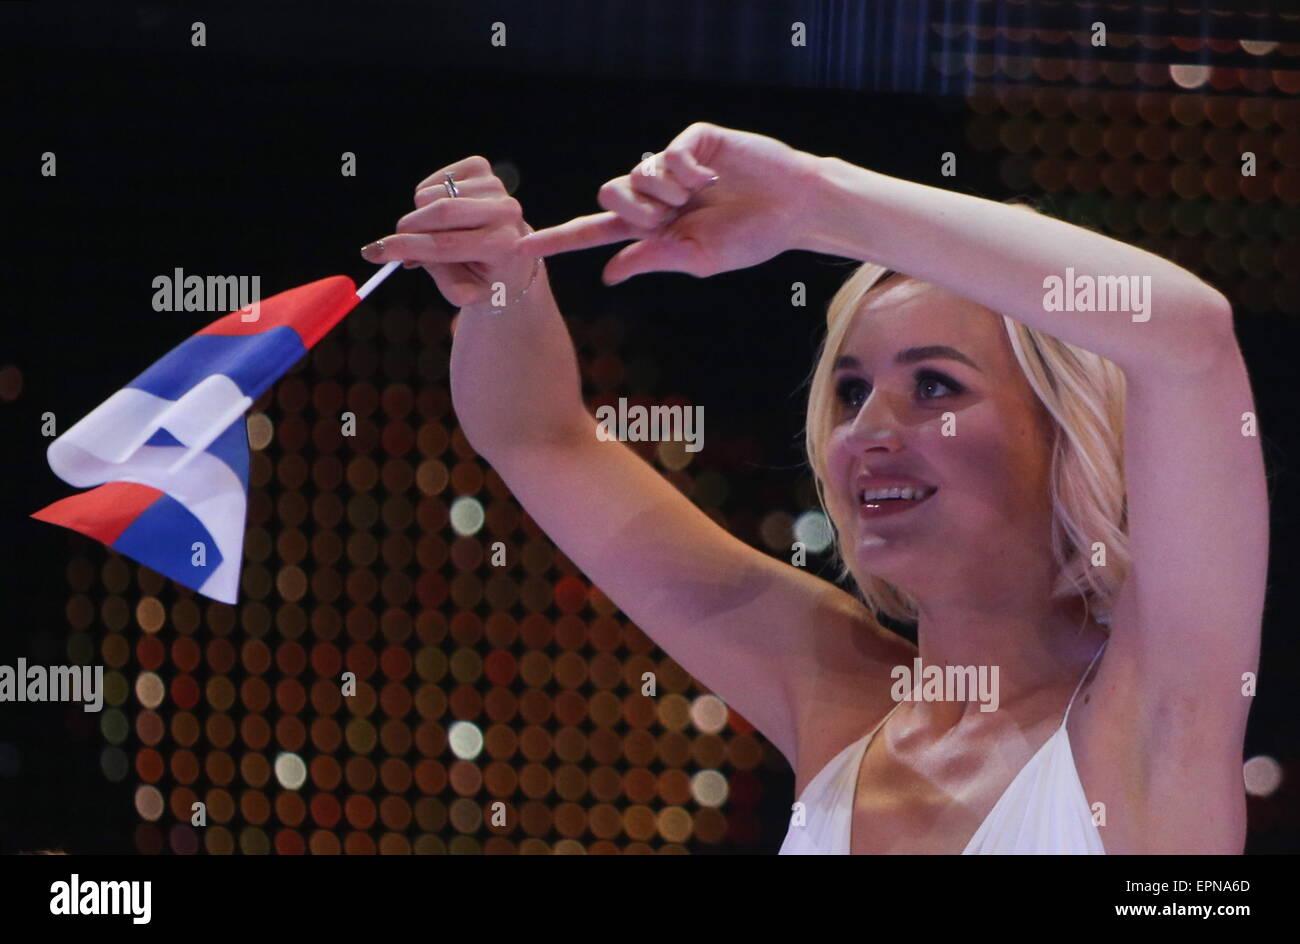 Russian singer Polina Gagarina reached the Eurovision final 20.05.2015 66